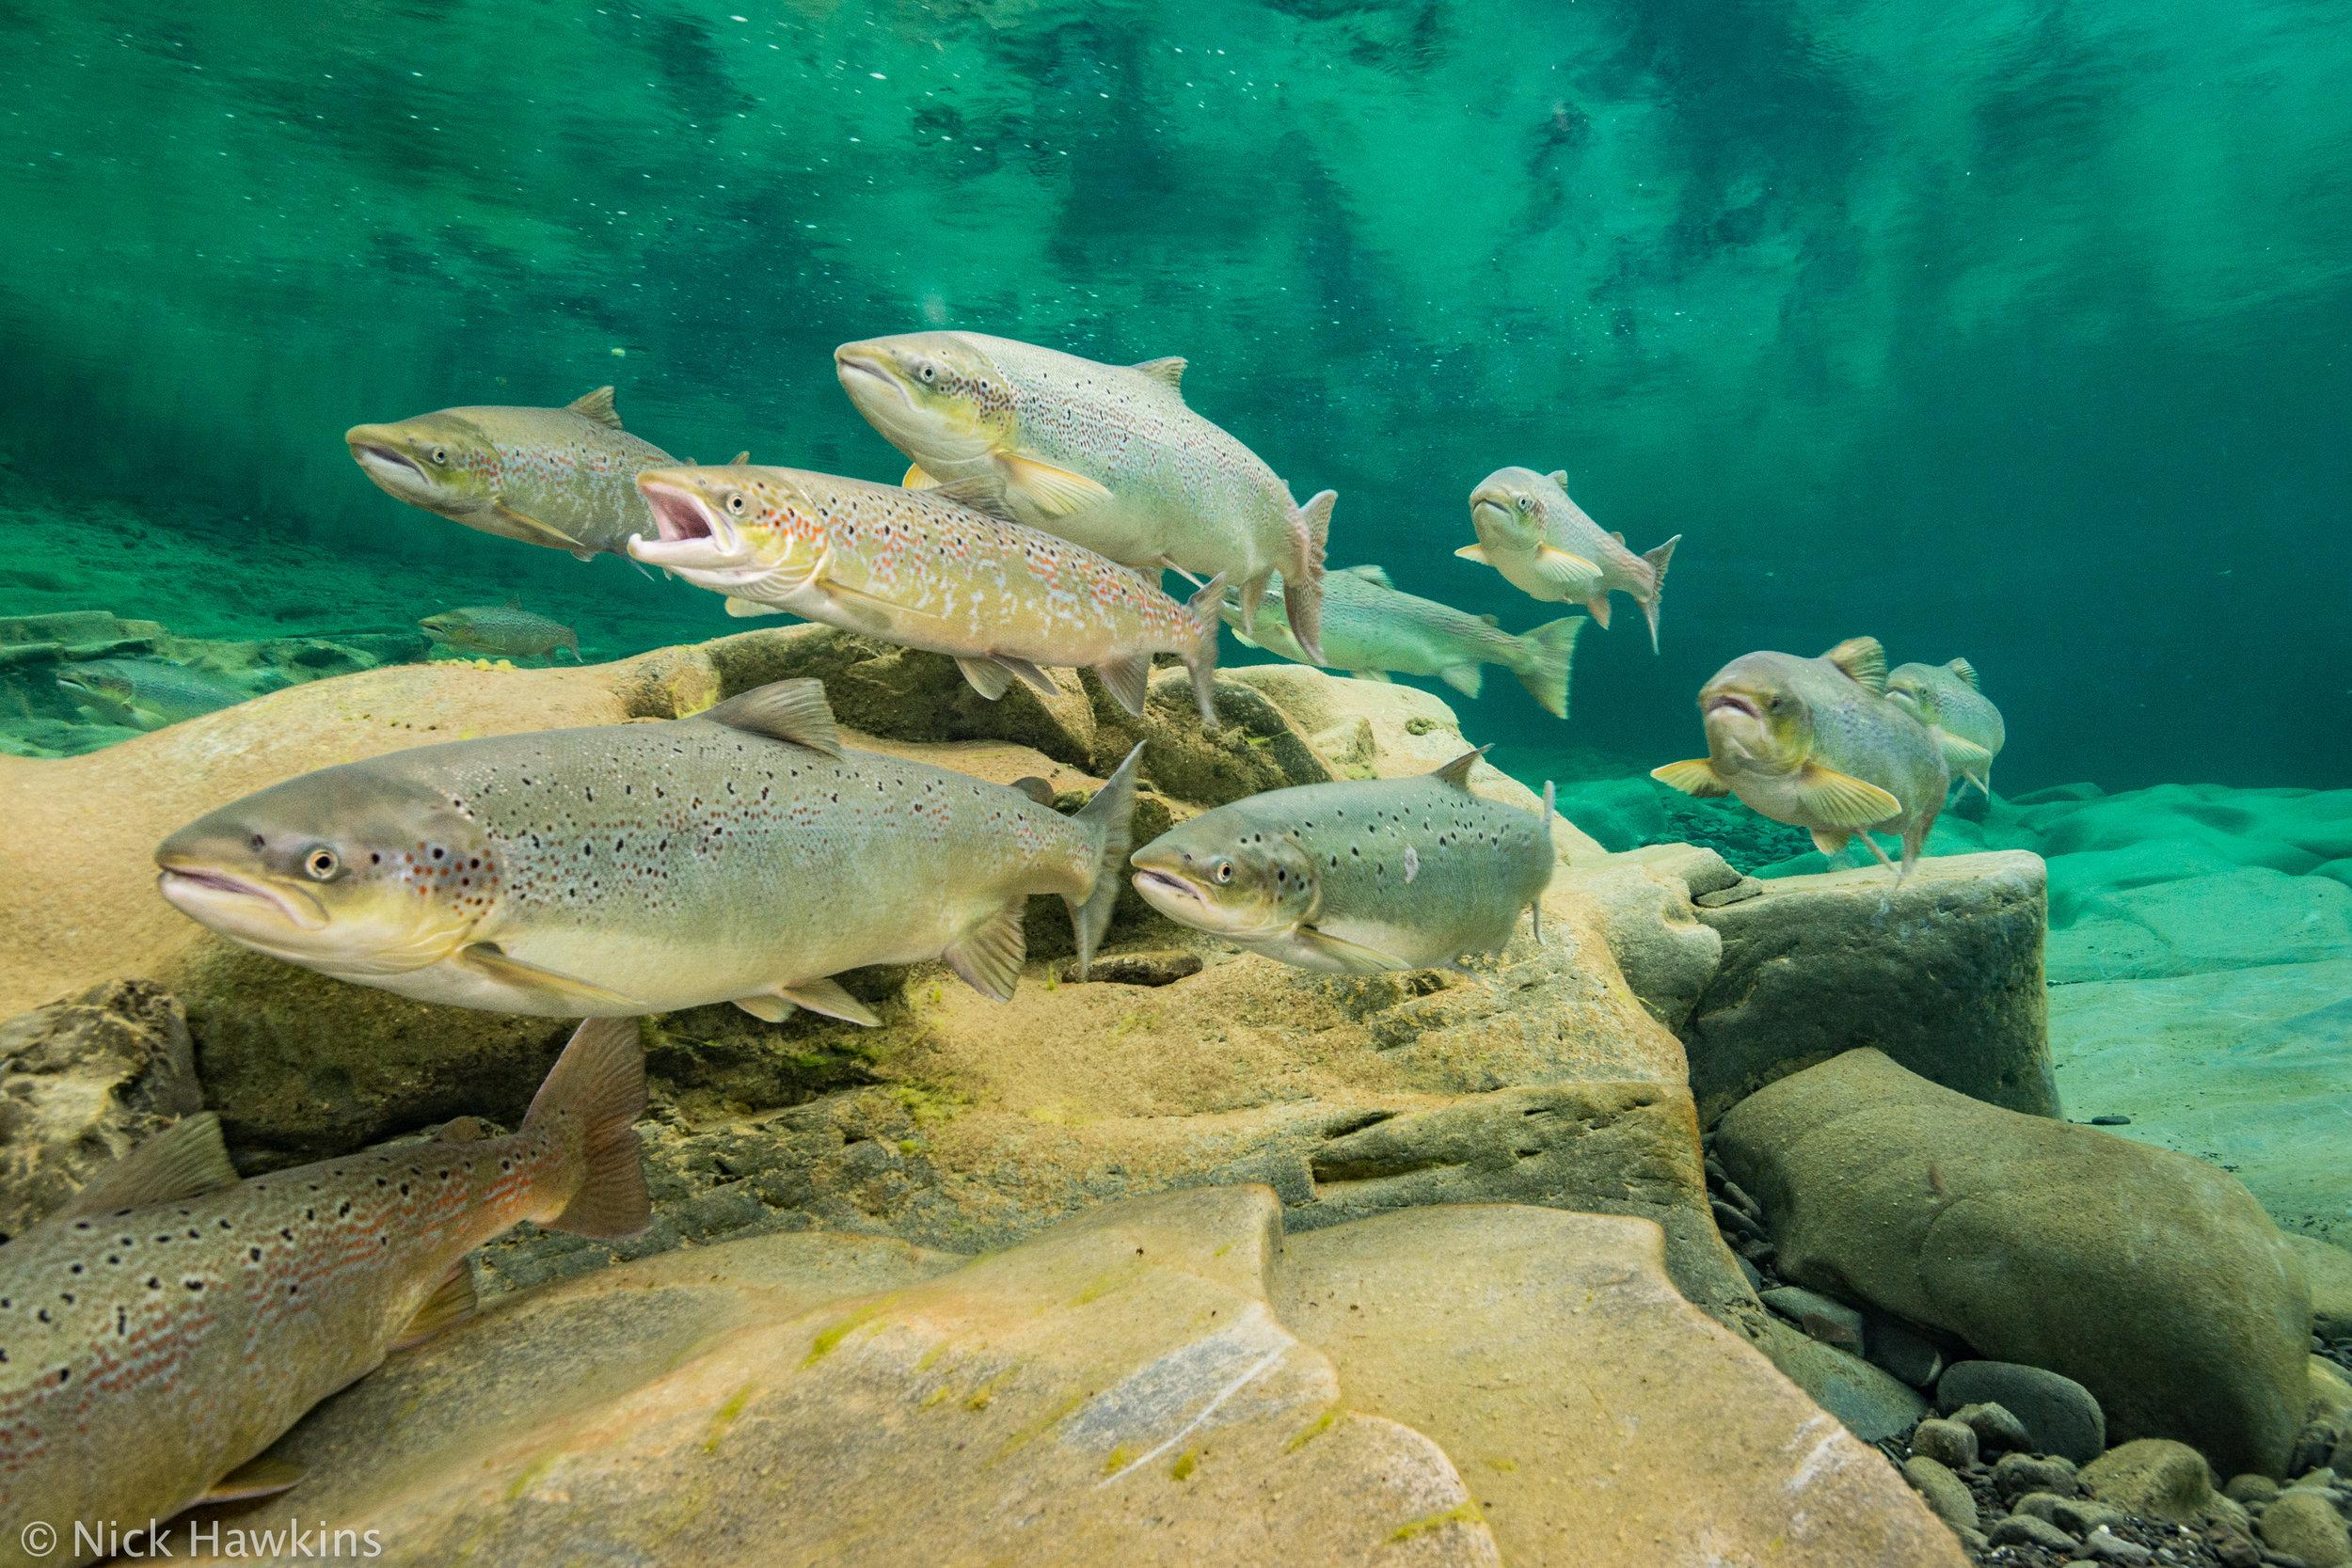 Gaspé-Saving-Salmon-Nick-Hawkins-2562.jpg